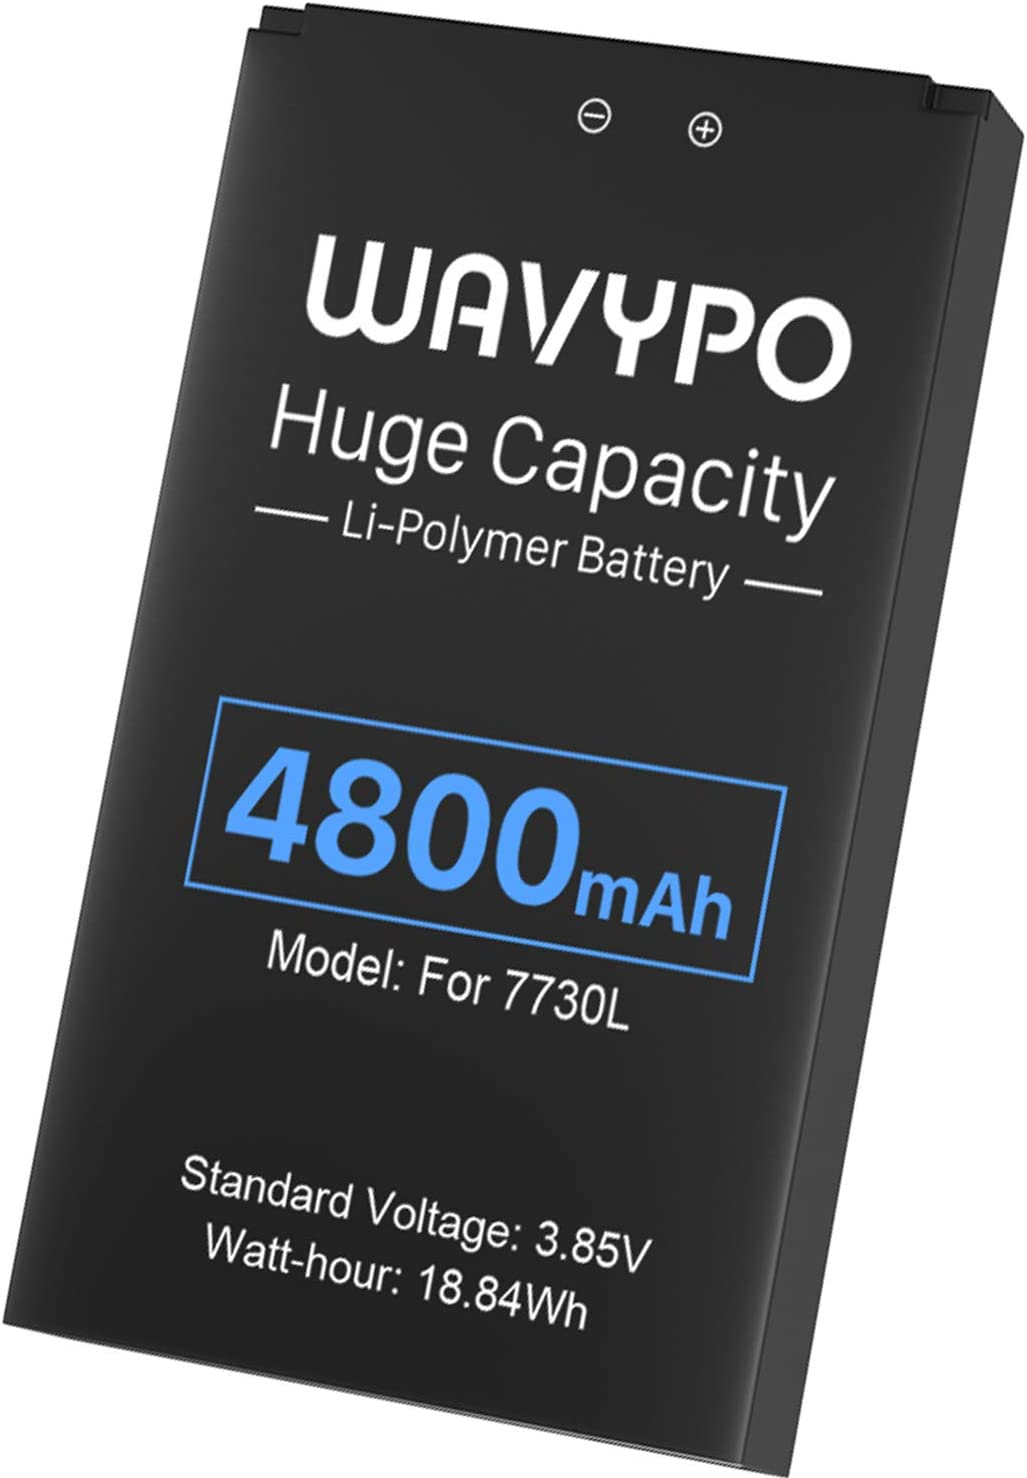 4800mAh Upgraded Mifi 7730L Battery, for Verizon Novatel Jetpack MiFi 7730L/ 8800L Mobile Hotspot P/N: 40123117 Replacemet Battery Wavypo